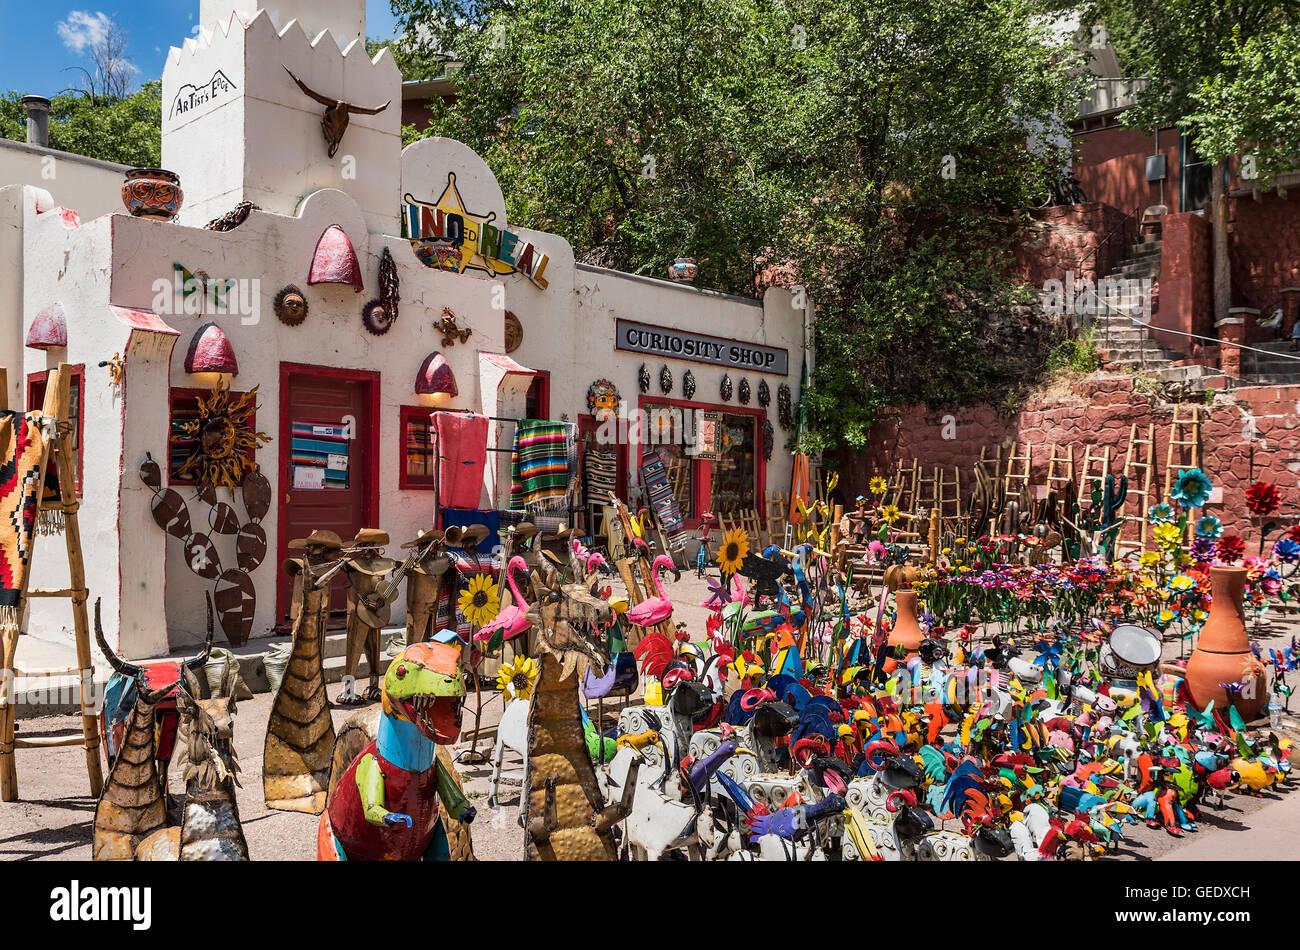 Colorful curiosity shop, Manitou Springs, Colorado, USA. - Stock Image